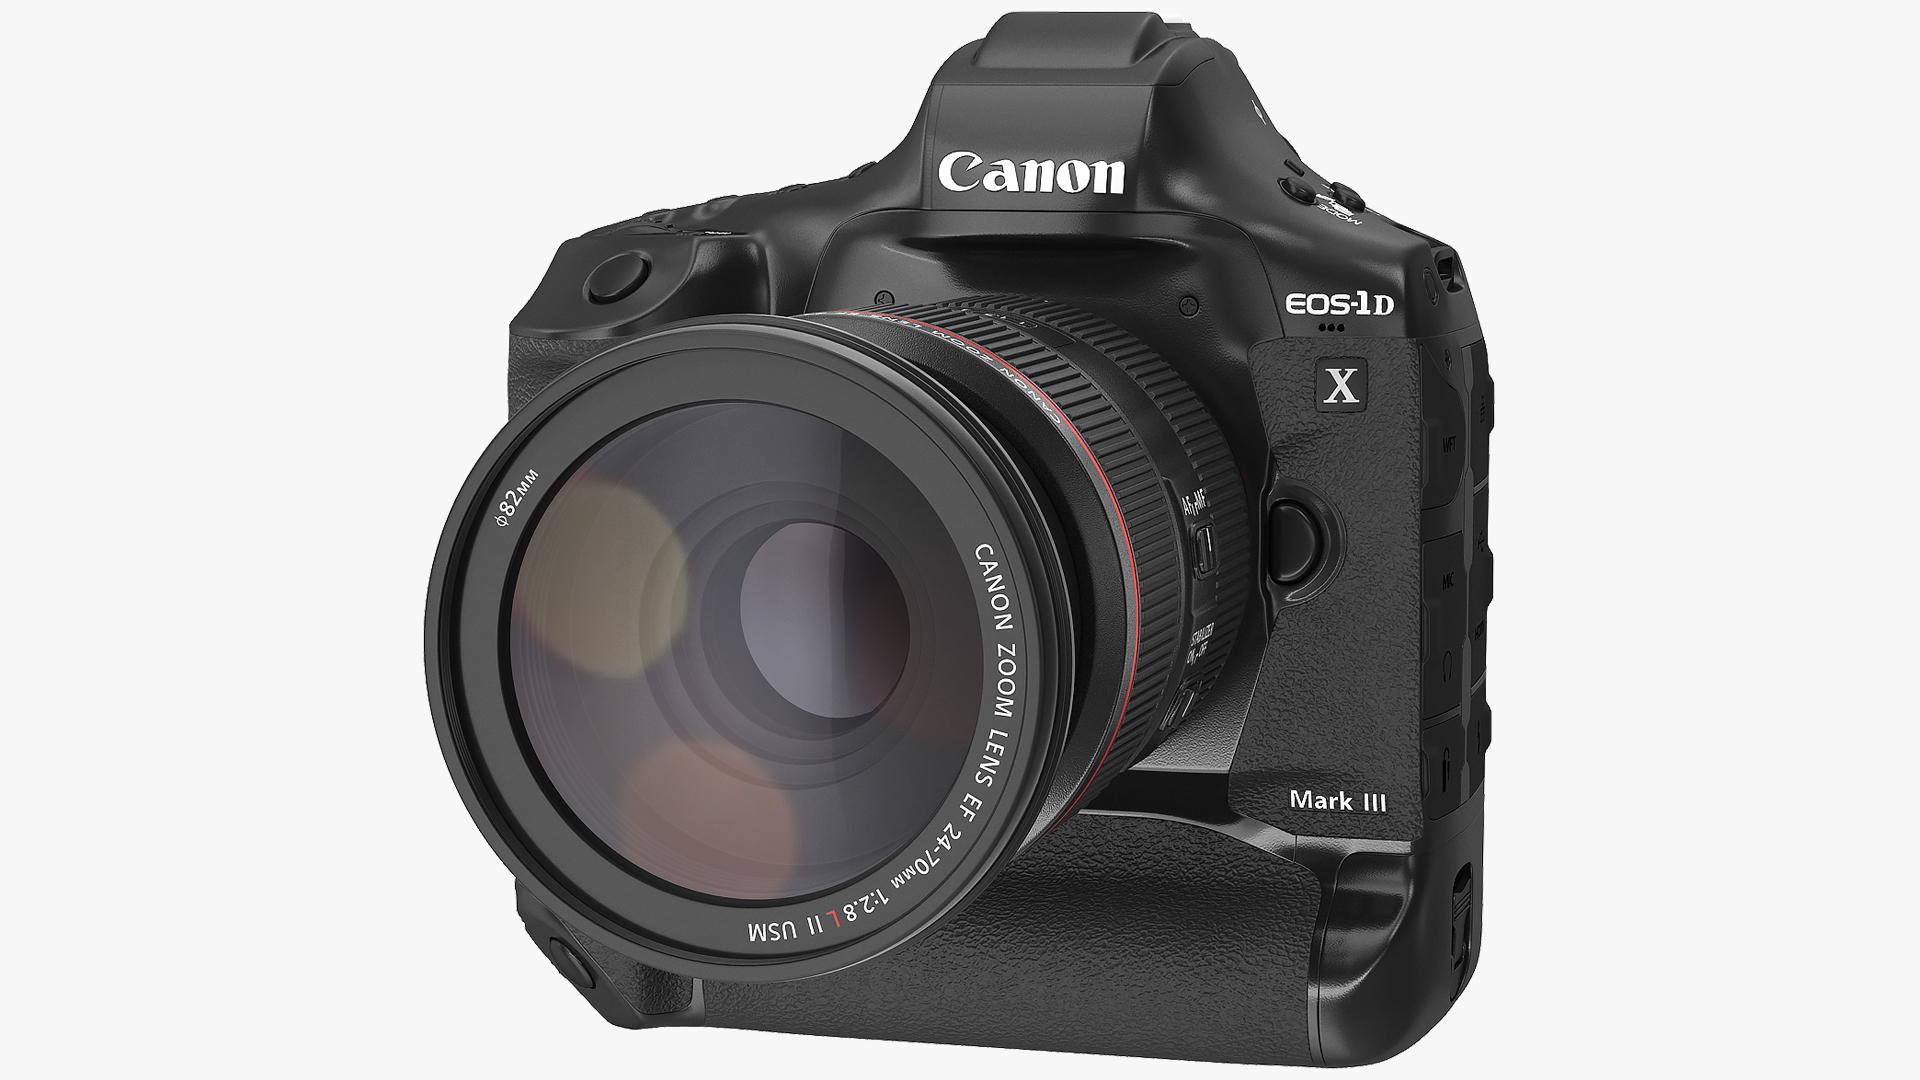 canon 1dx zoom lens 3D model https://static.turbosquid.com/Preview/2020/07/29__05_10_05/Canon1DXwithZoomLens24703dmodel001.jpgDE8576D9-1ECE-4CEF-B9B4-5538B1A75102Default.jpg